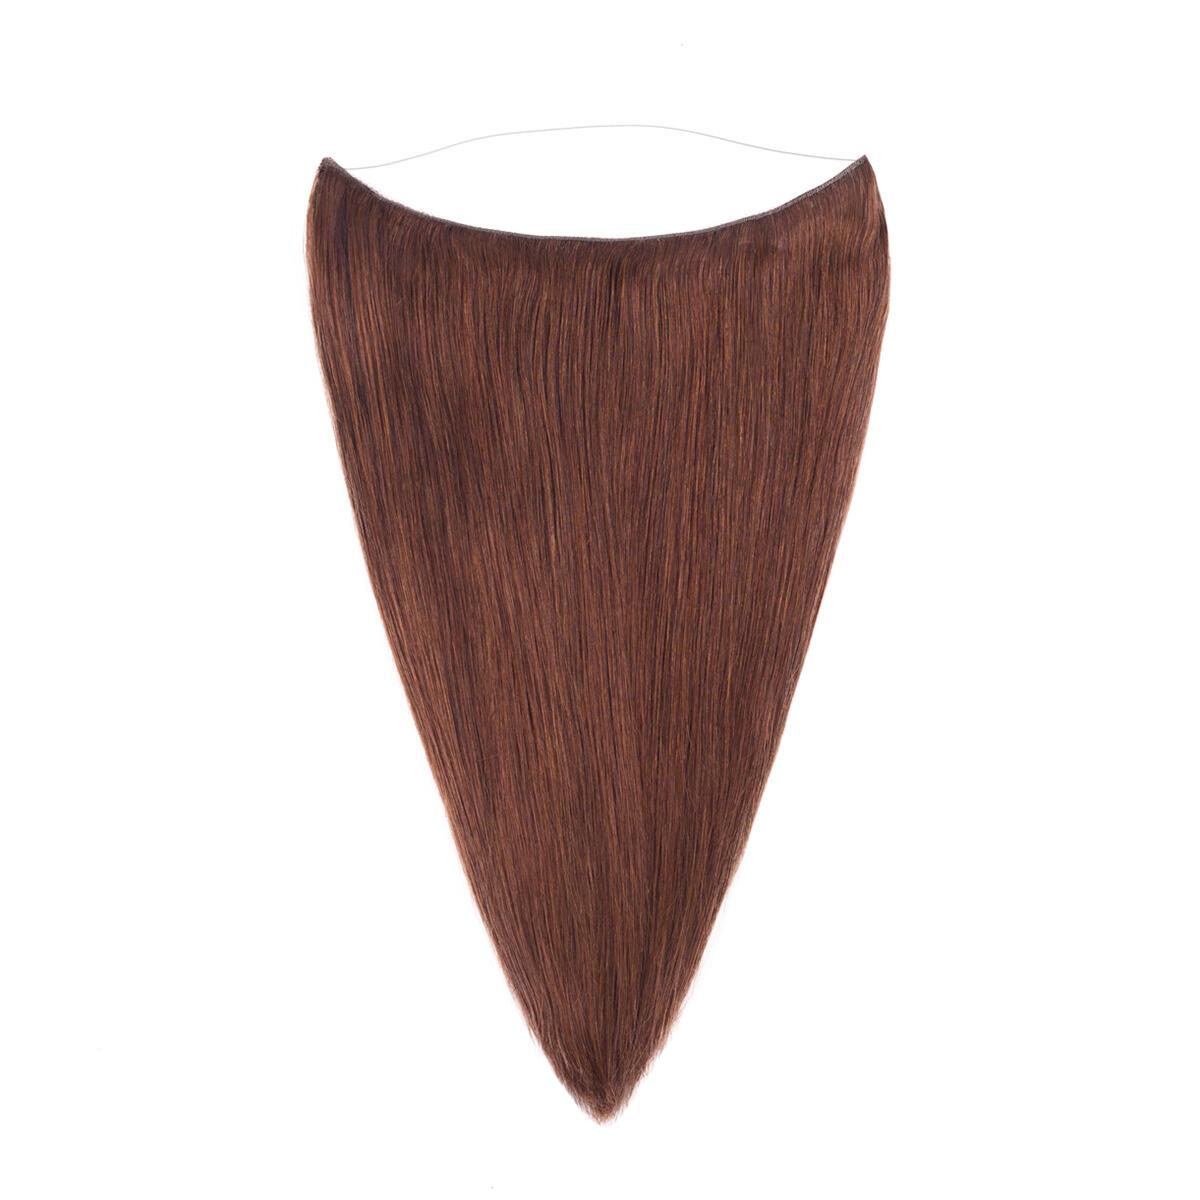 Hairband Original 2.0 Dark Brown 45 cm